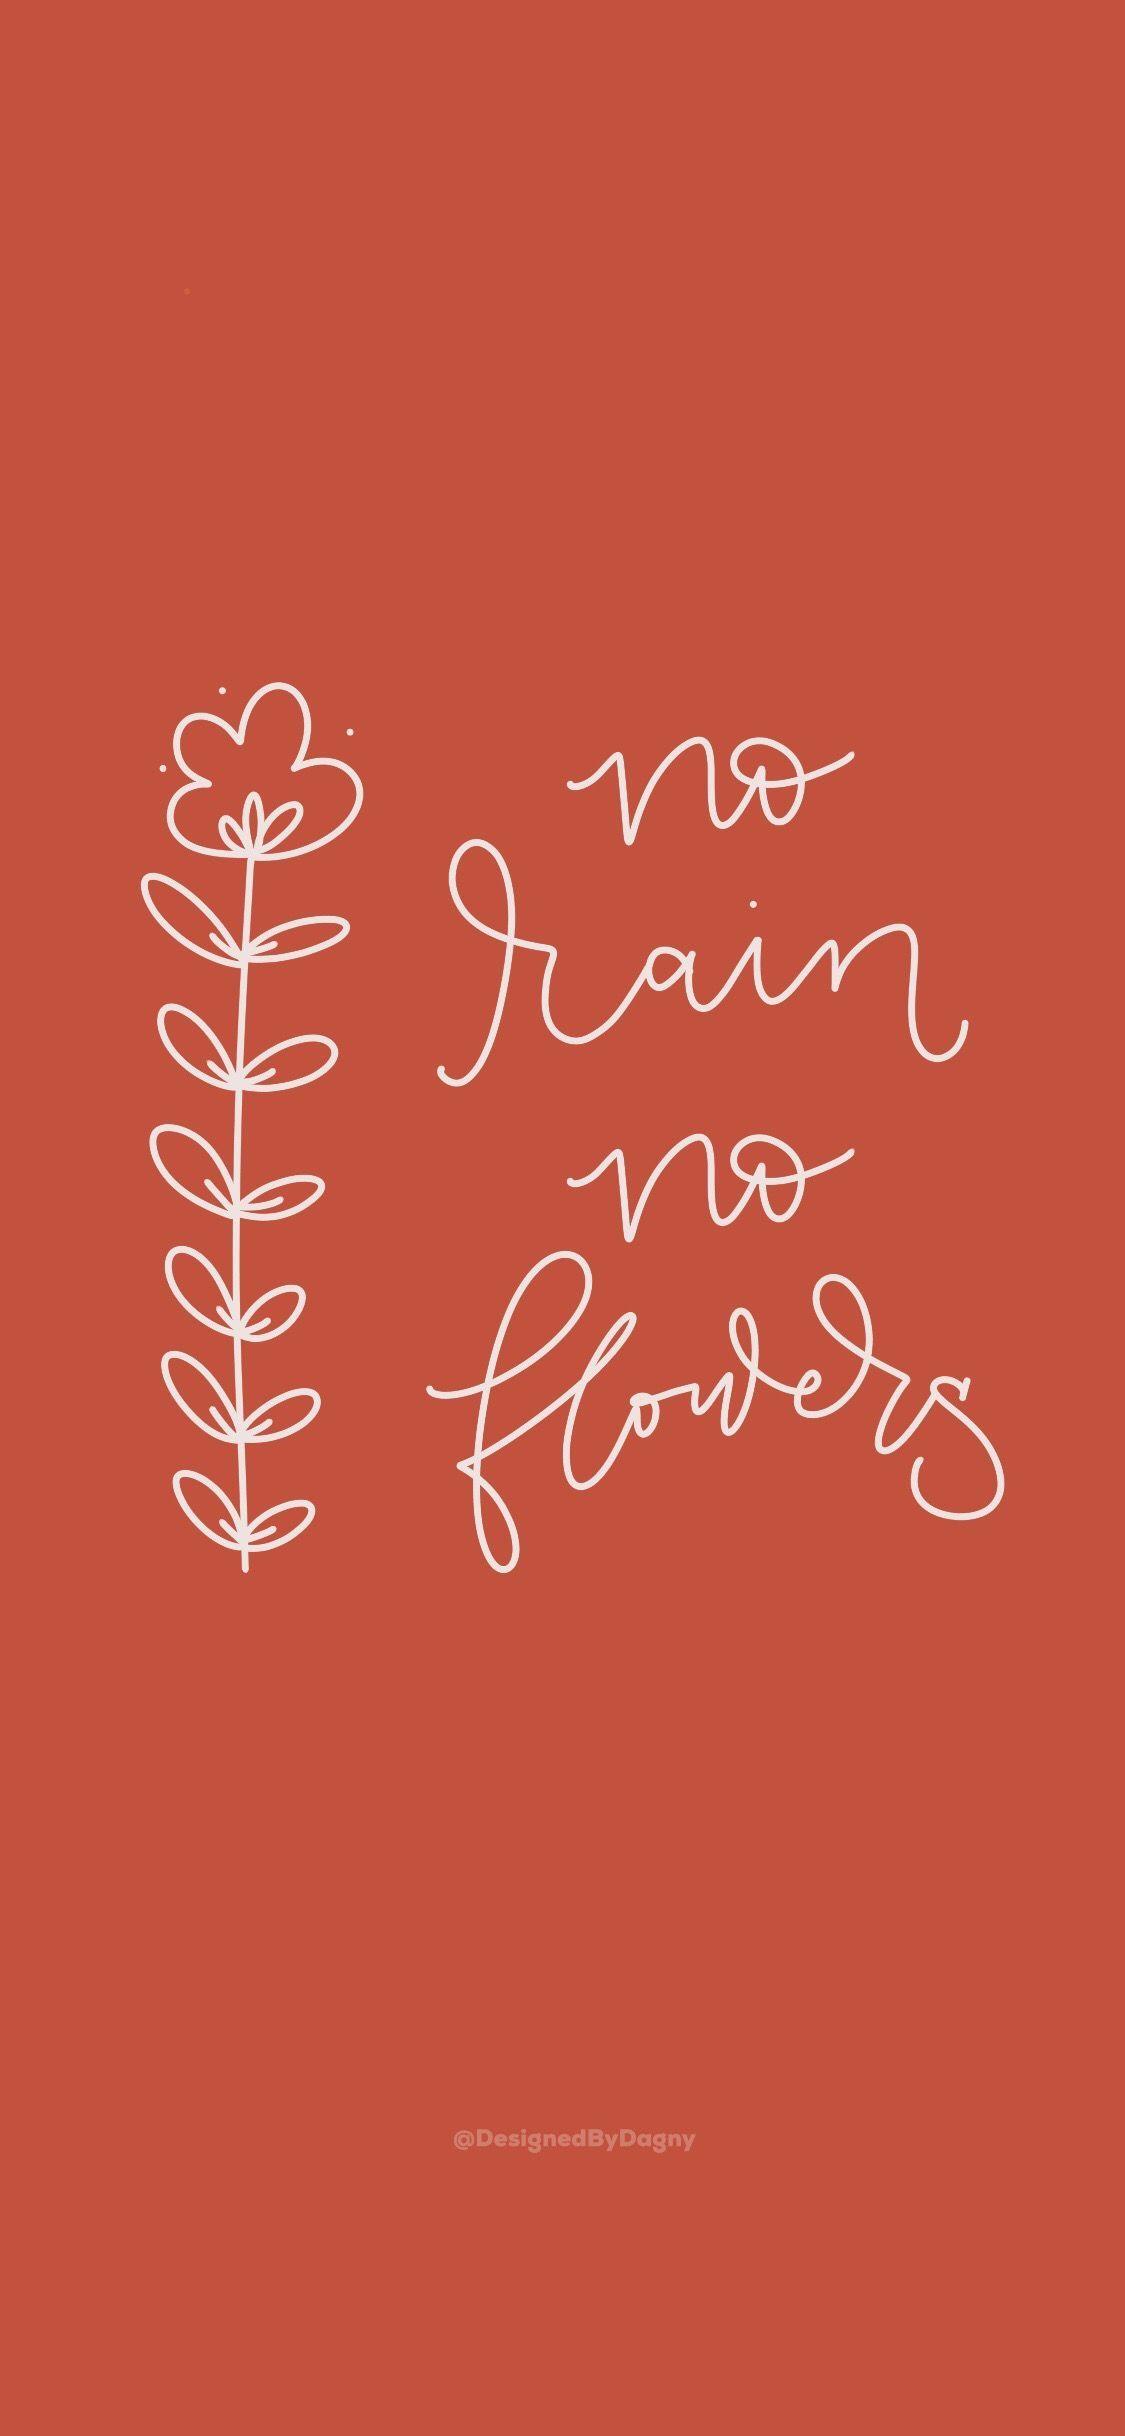 3 Phone Wallpapers, No Rain No Flowers Lock Screen Home Screen Art, Motivational Sayings #wallphone